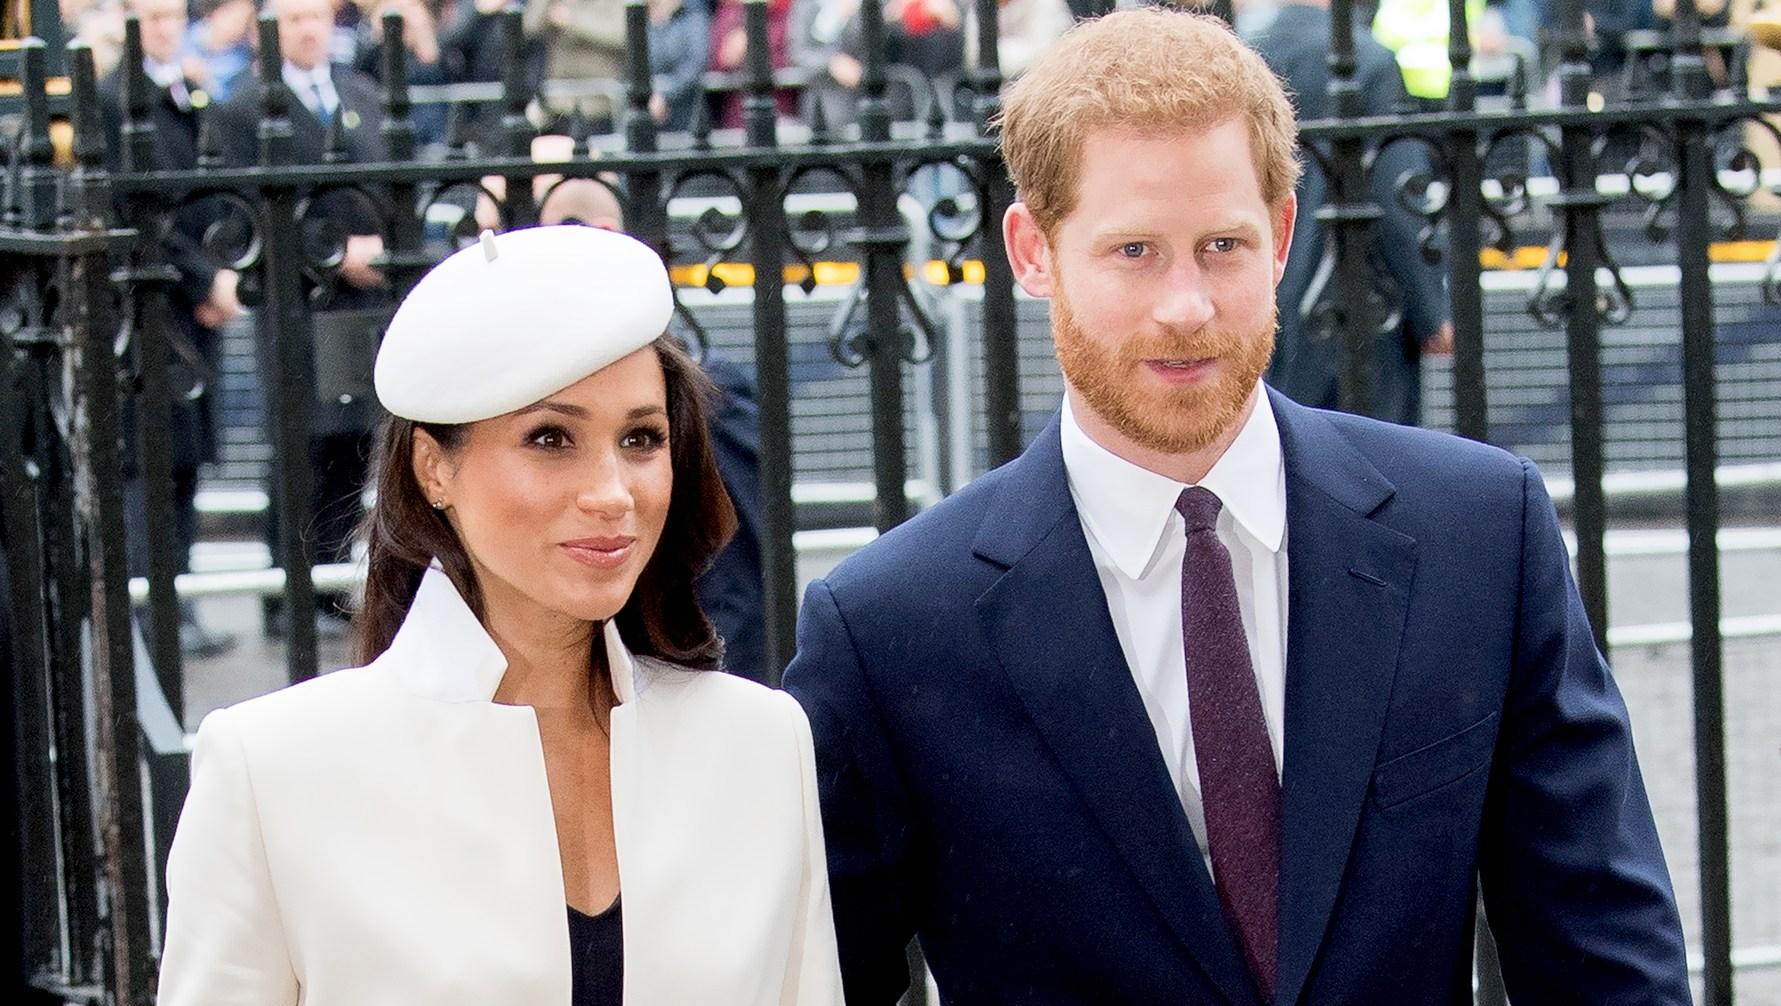 Prince-Harry-and-Meghan-Markle's-Wedding-Invitations